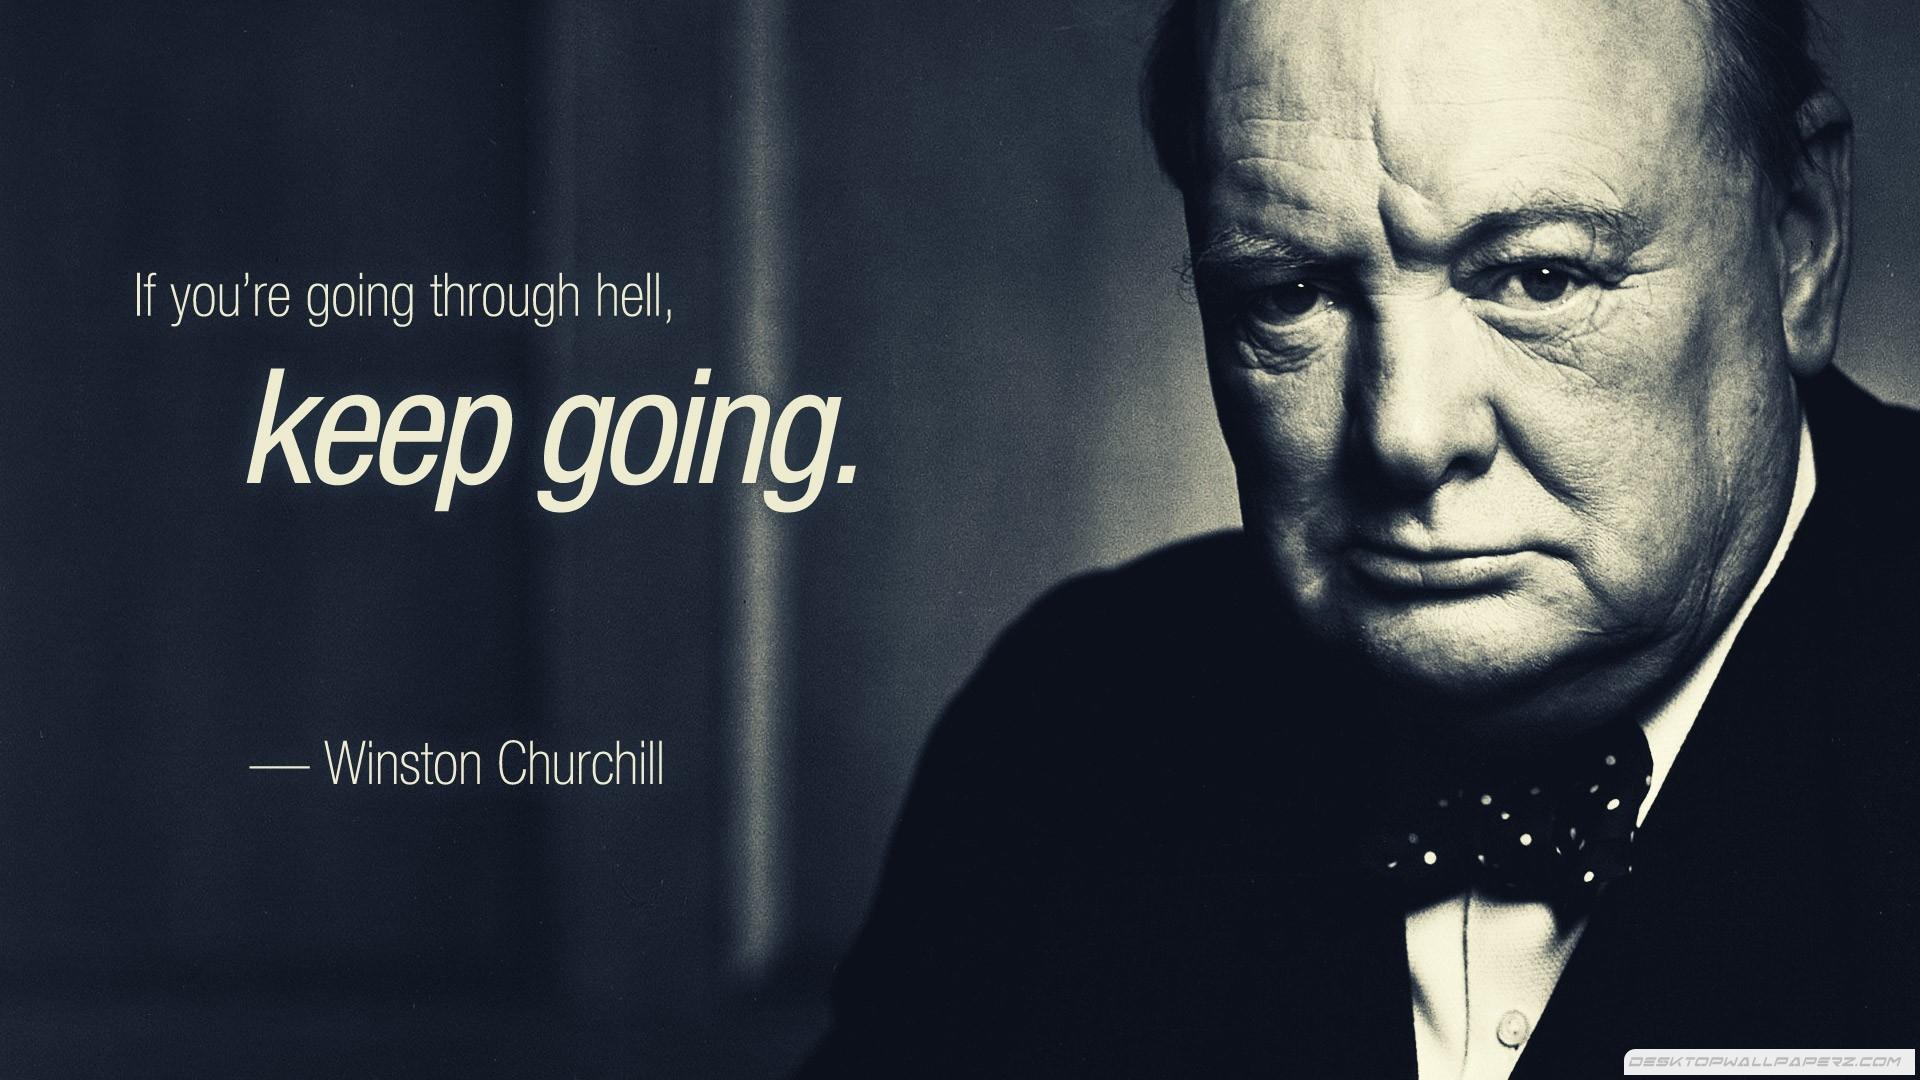 motivational_quotes_inspirational_winston_churchill.jpg